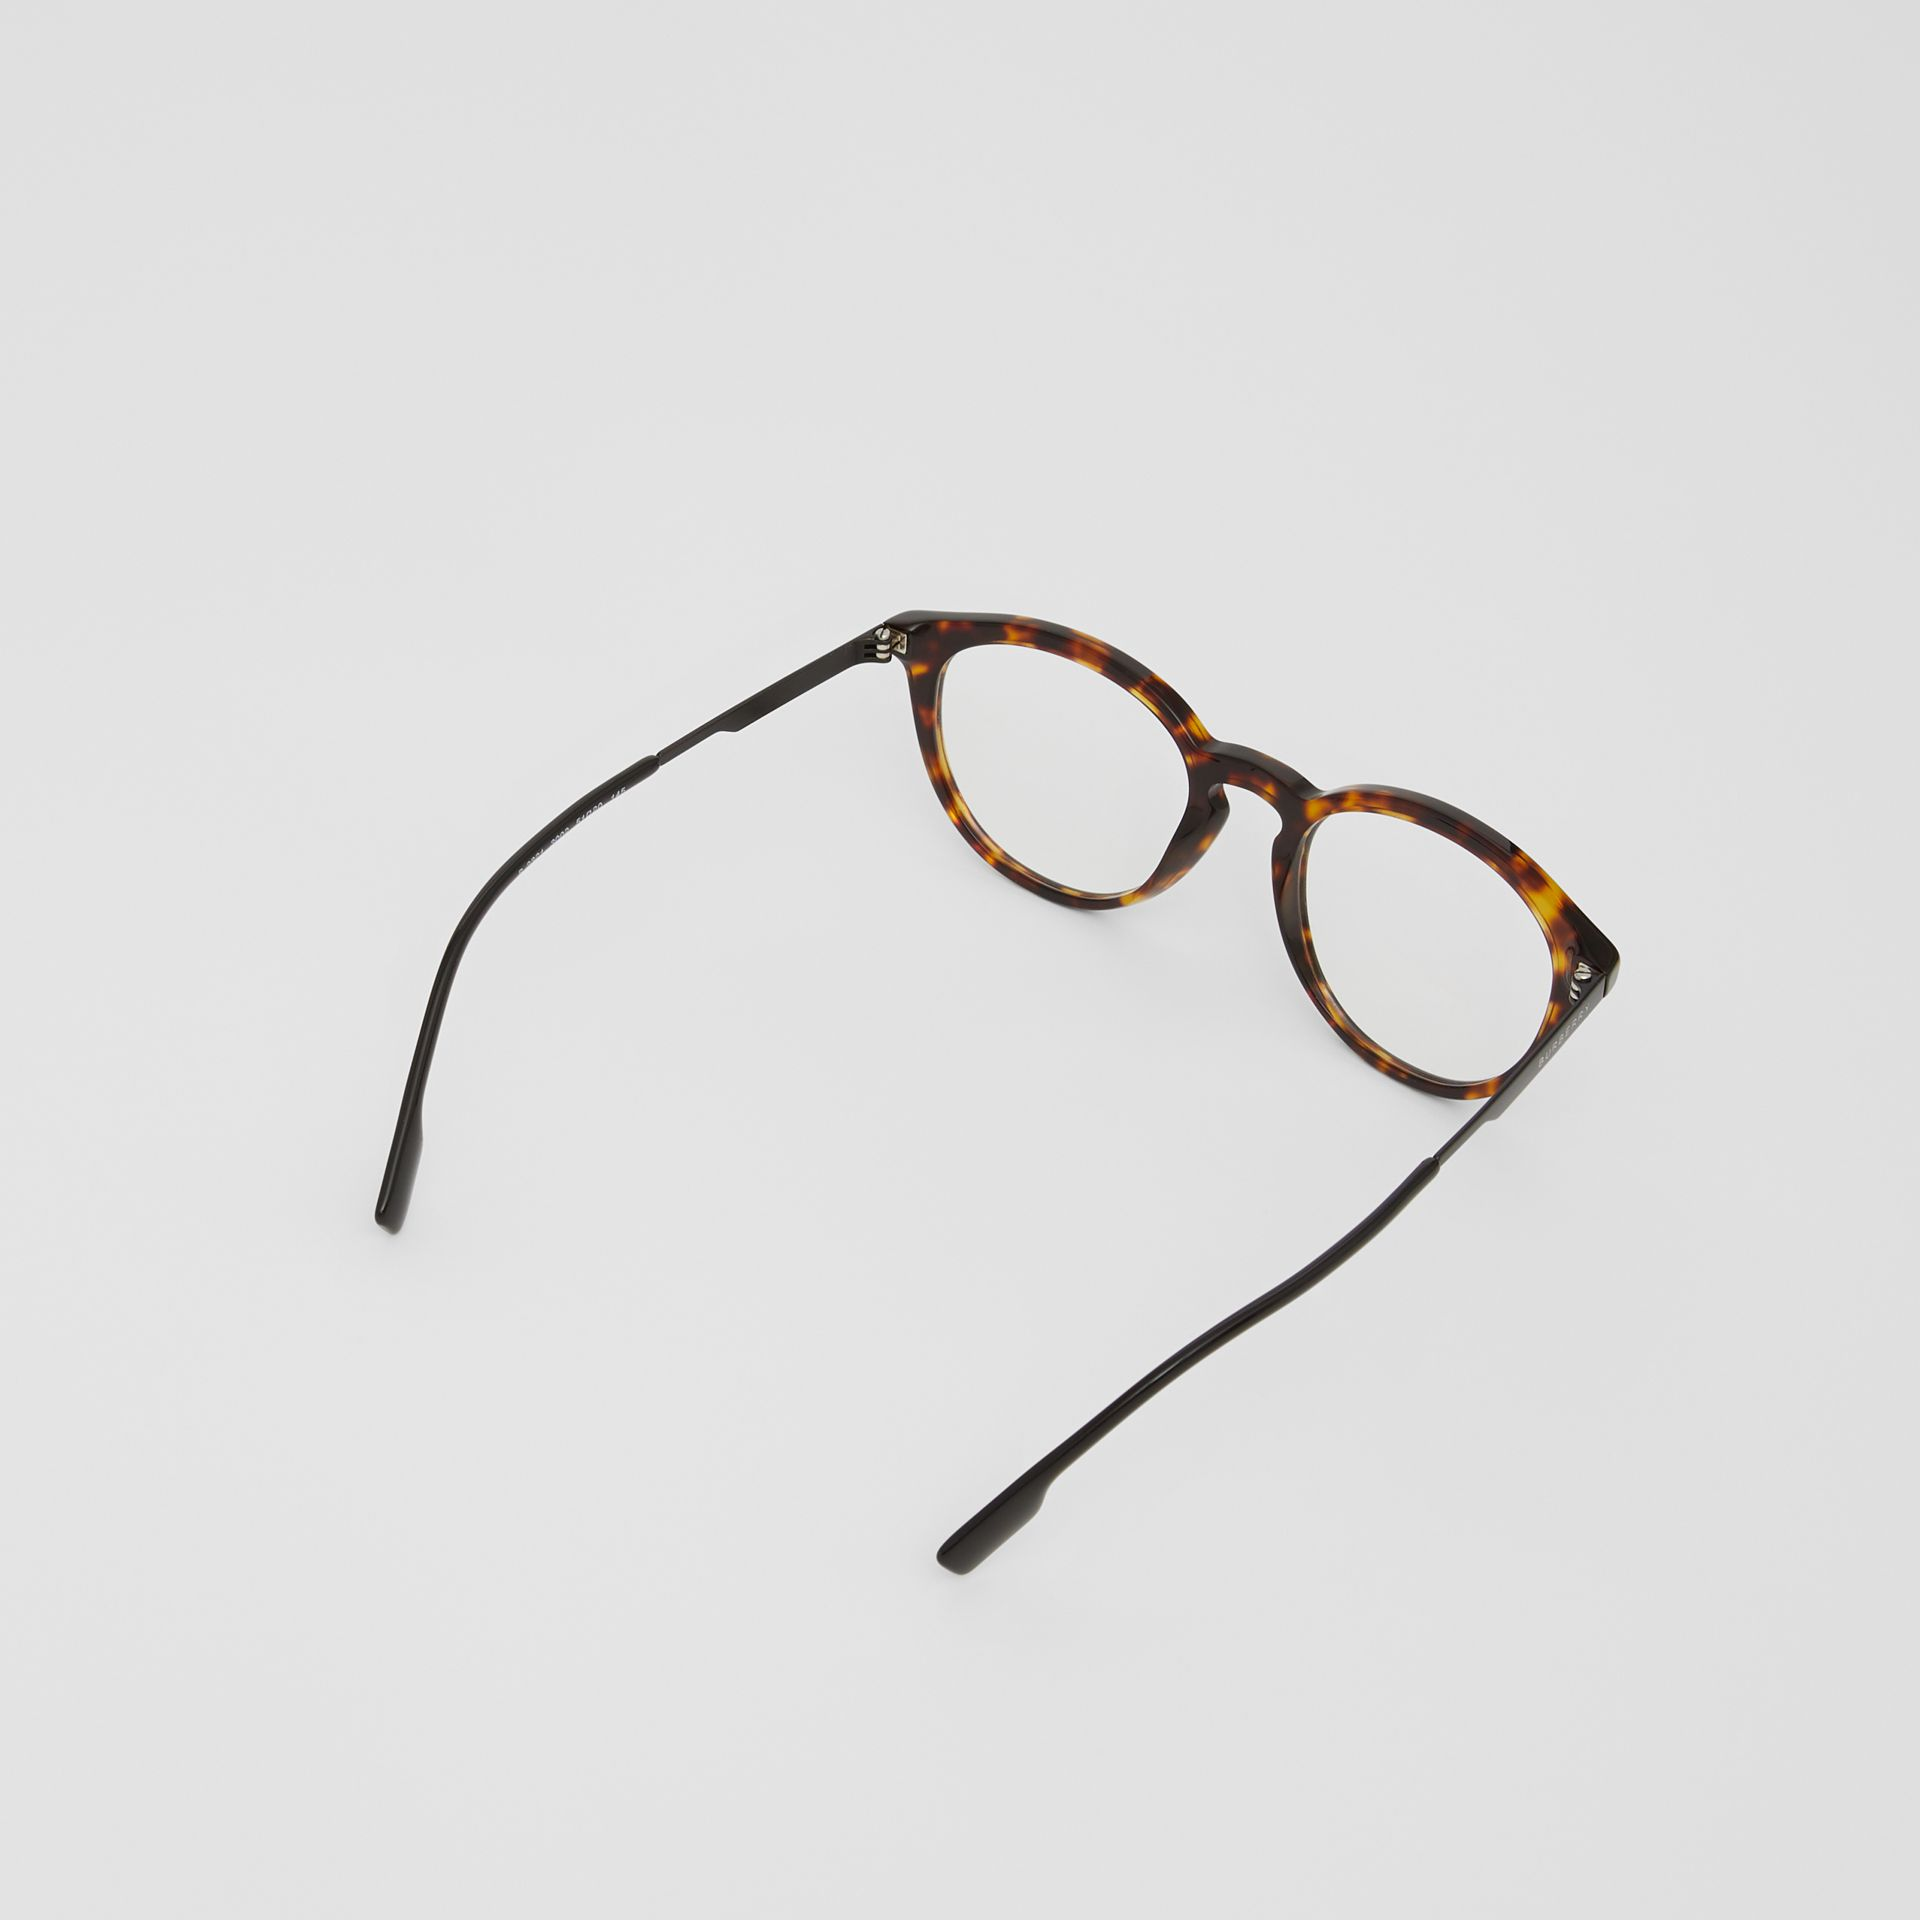 Round Optical Frames in Tortoiseshell - Men | Burberry - gallery image 4